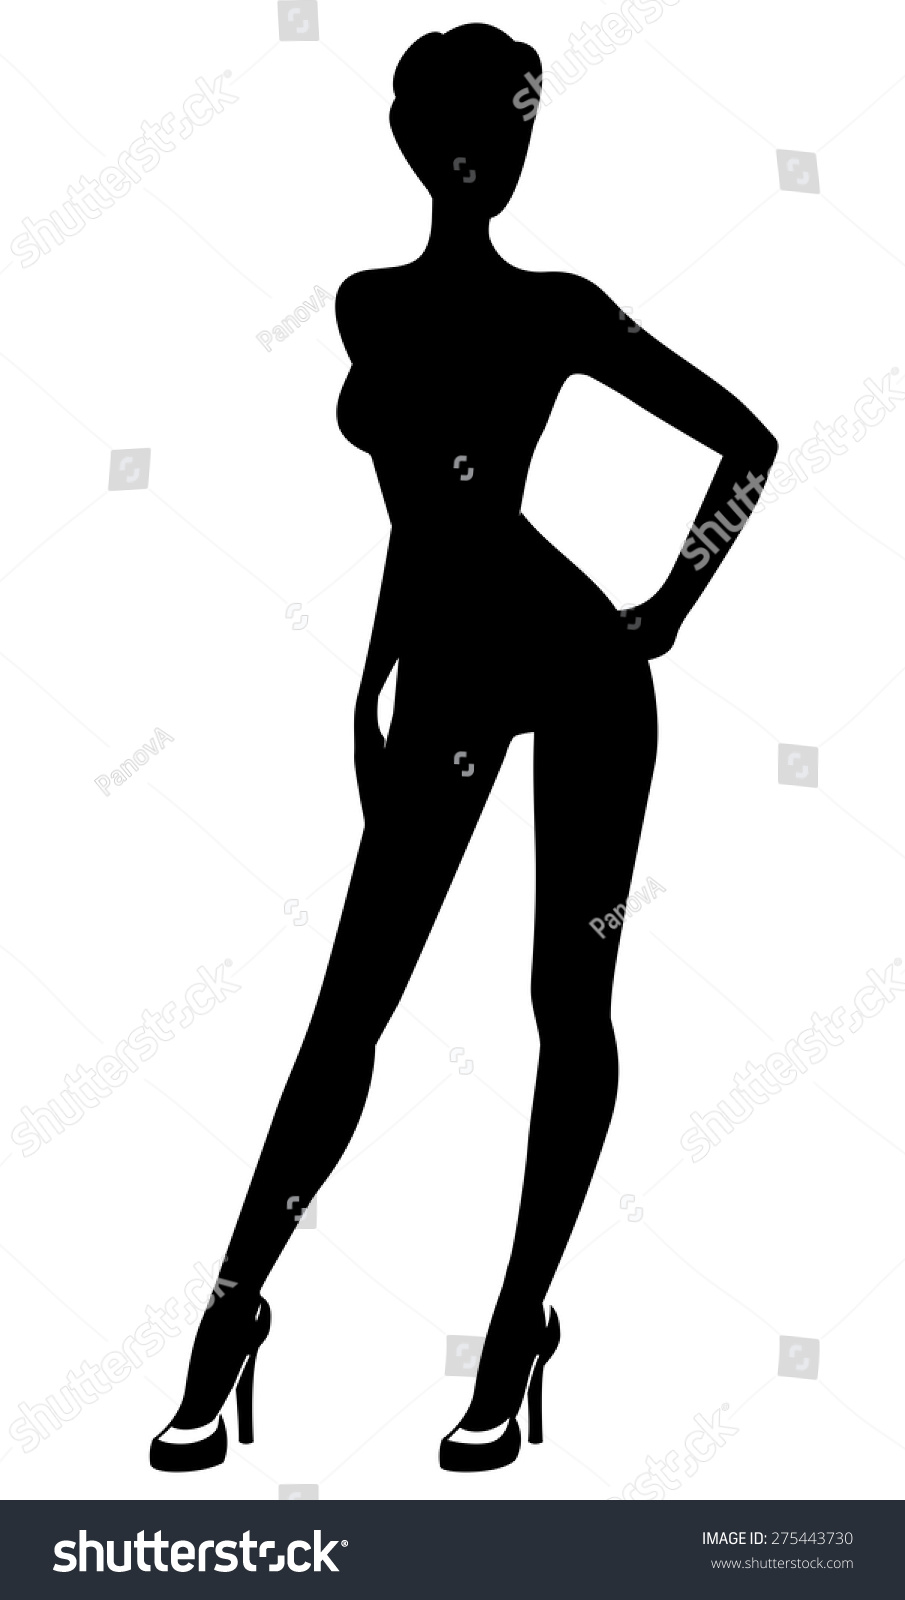 Christina applegate nude pussy